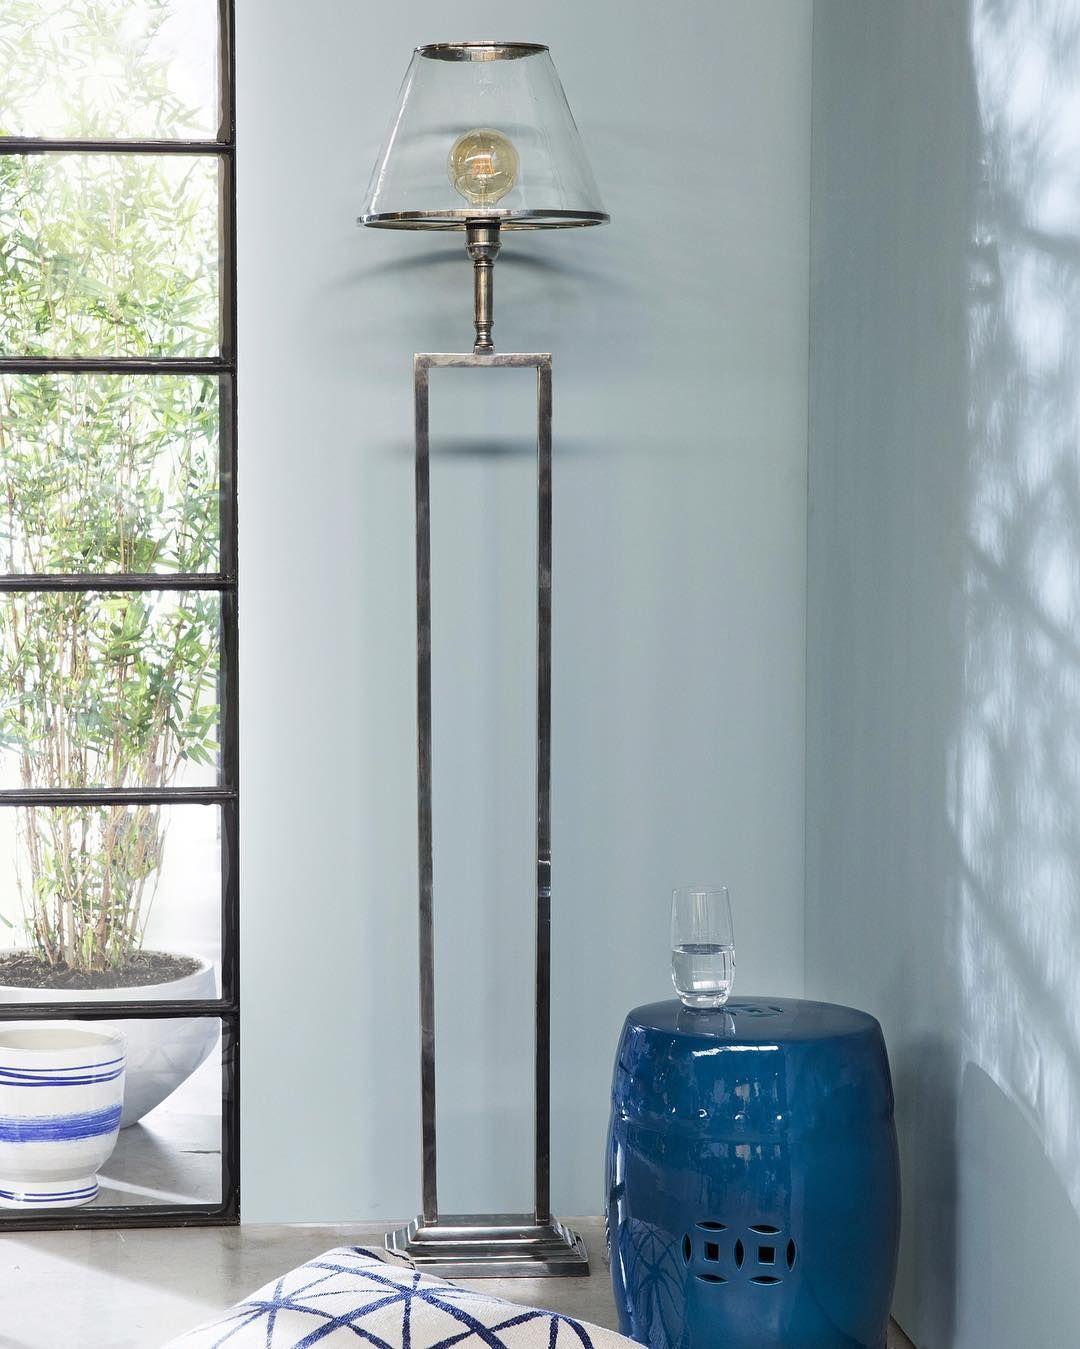 Pin By Veronique Legendre On Chambre A Coucher In 2020 Ladder Decor Decor Lamp